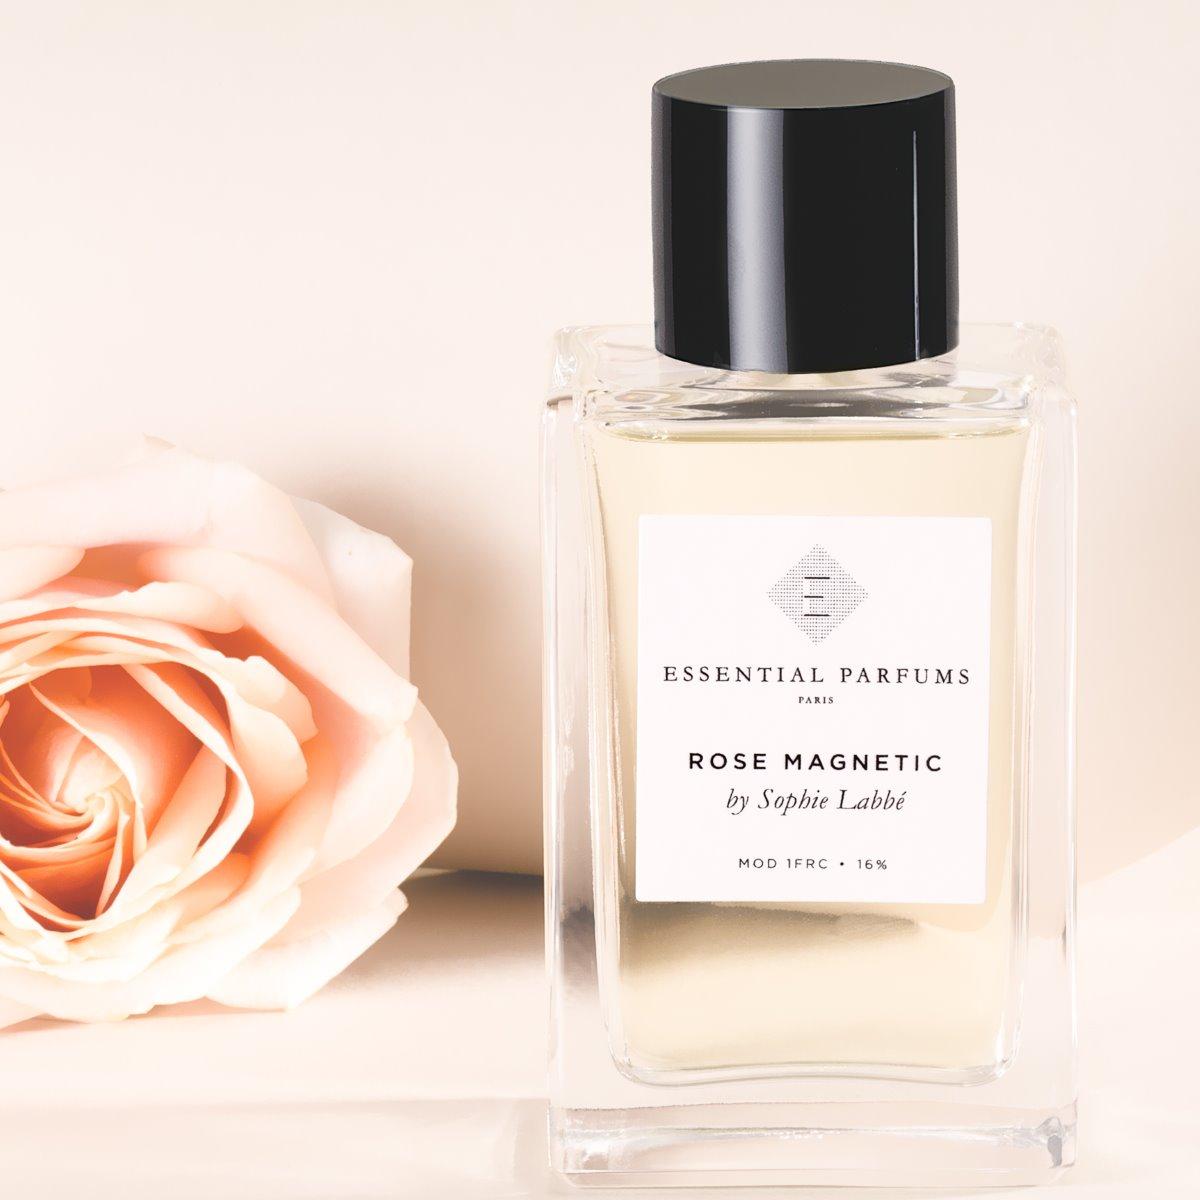 Rose Magnetic